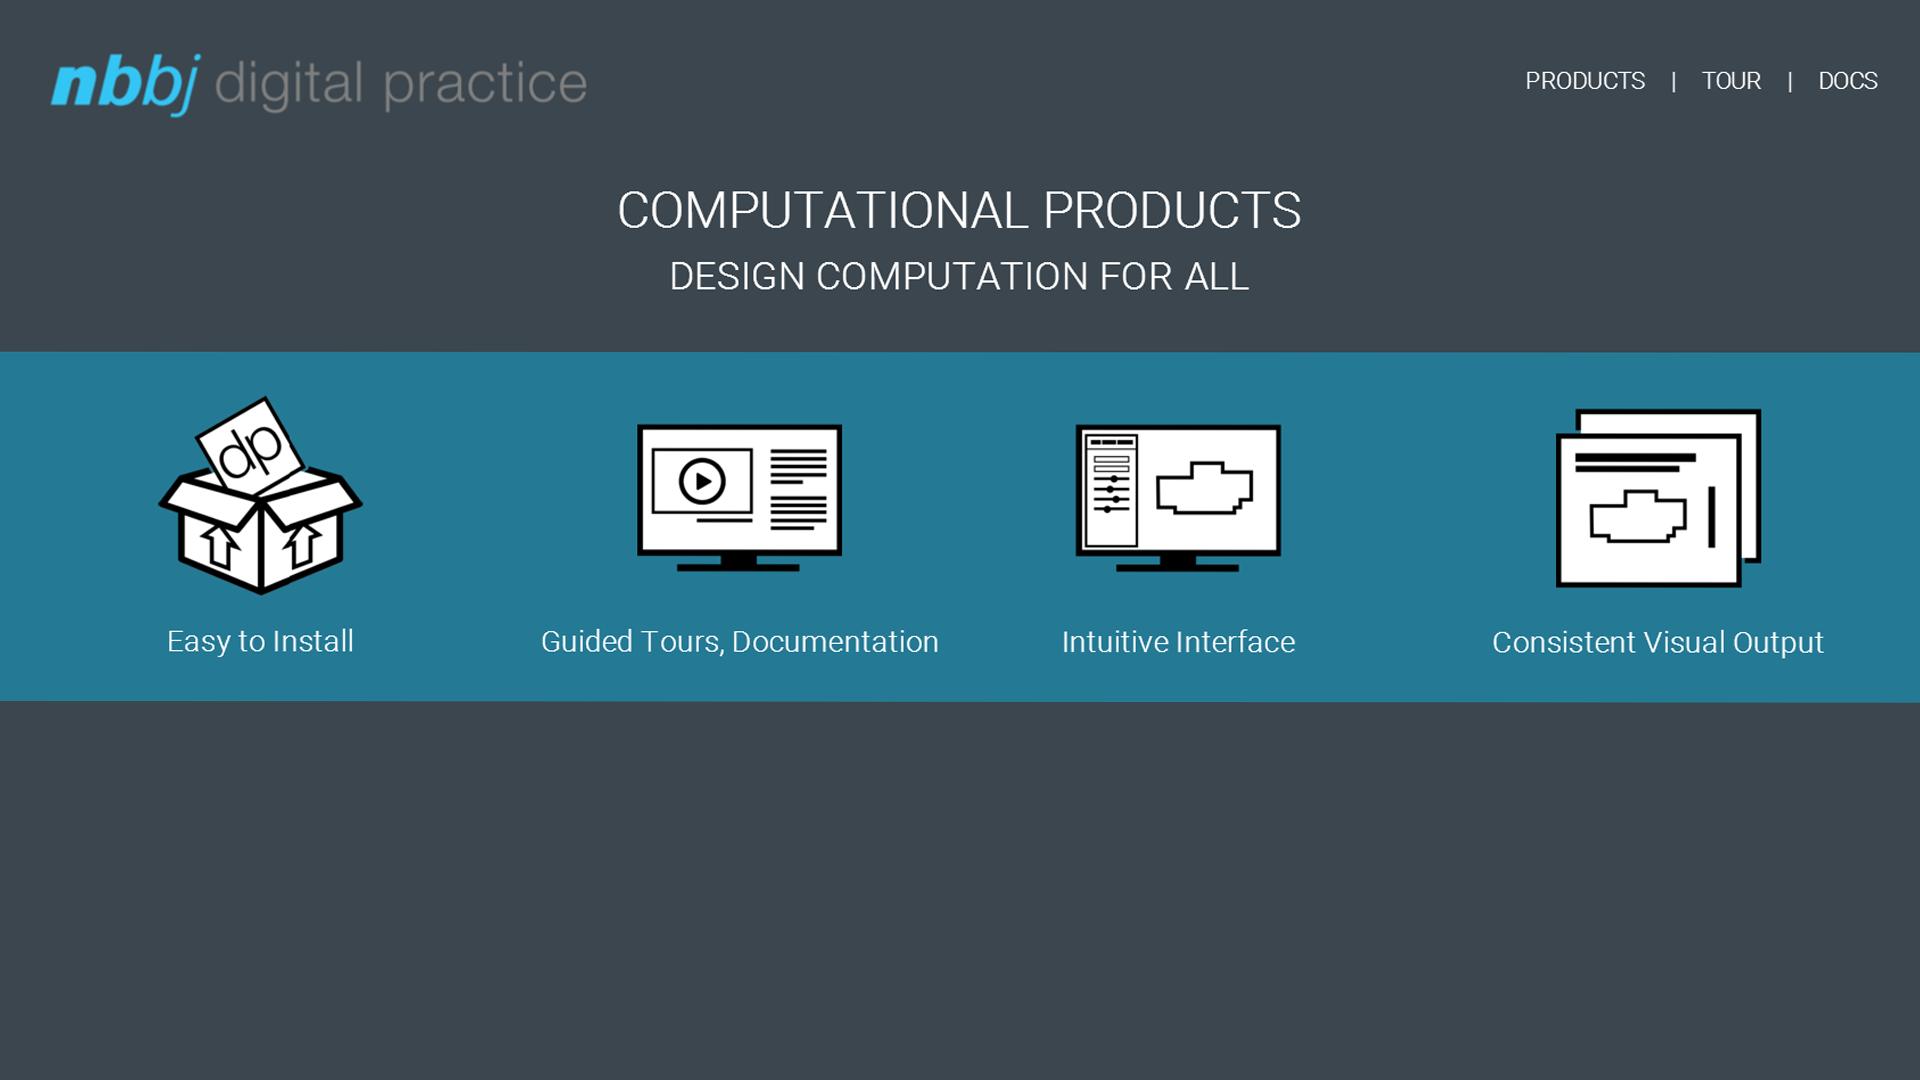 ComputationalProducts-splash.png